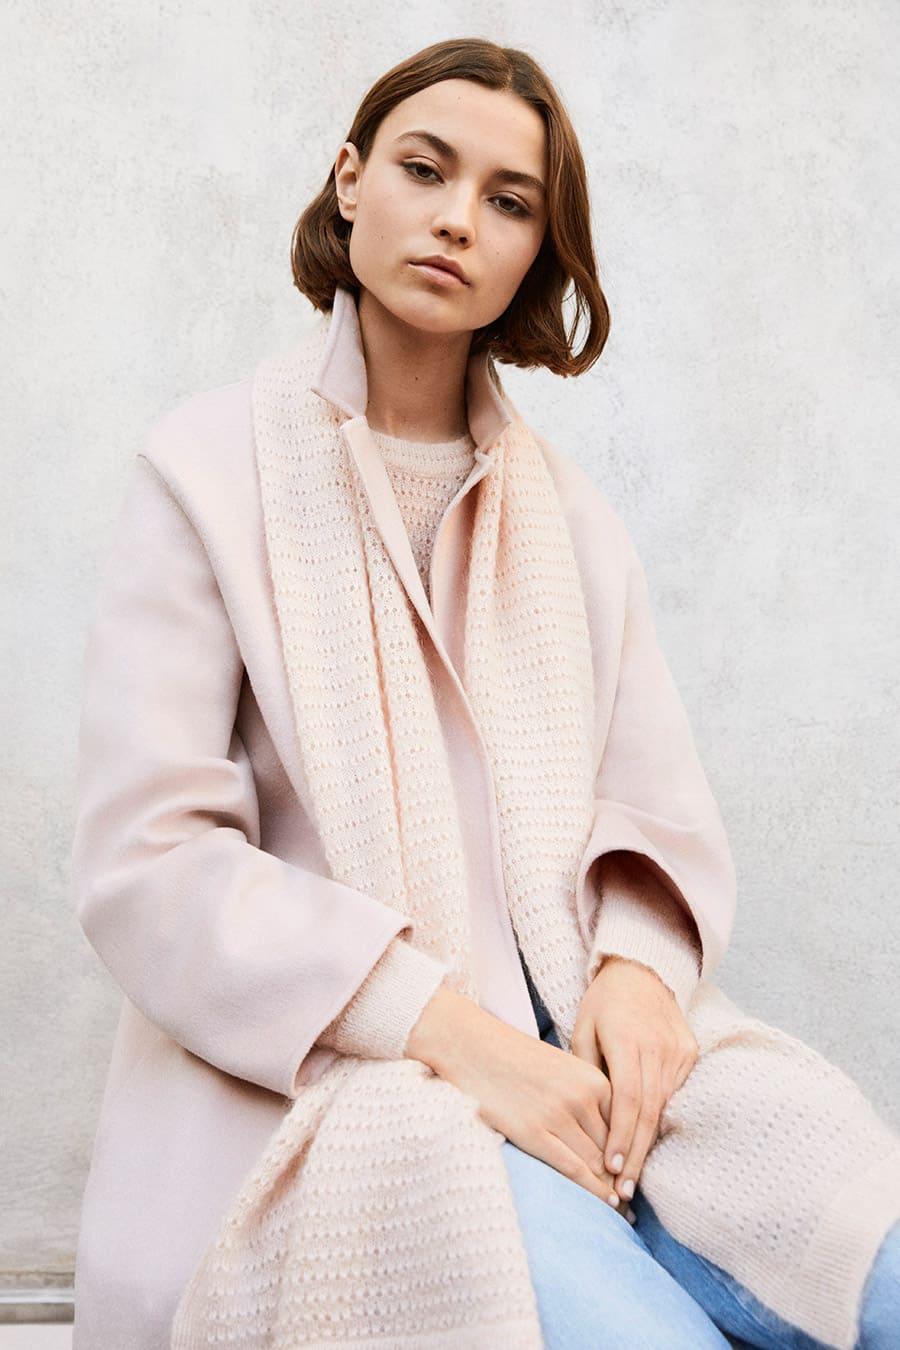 677ab85506d Lookbook Printemps 2019 - Mode femme